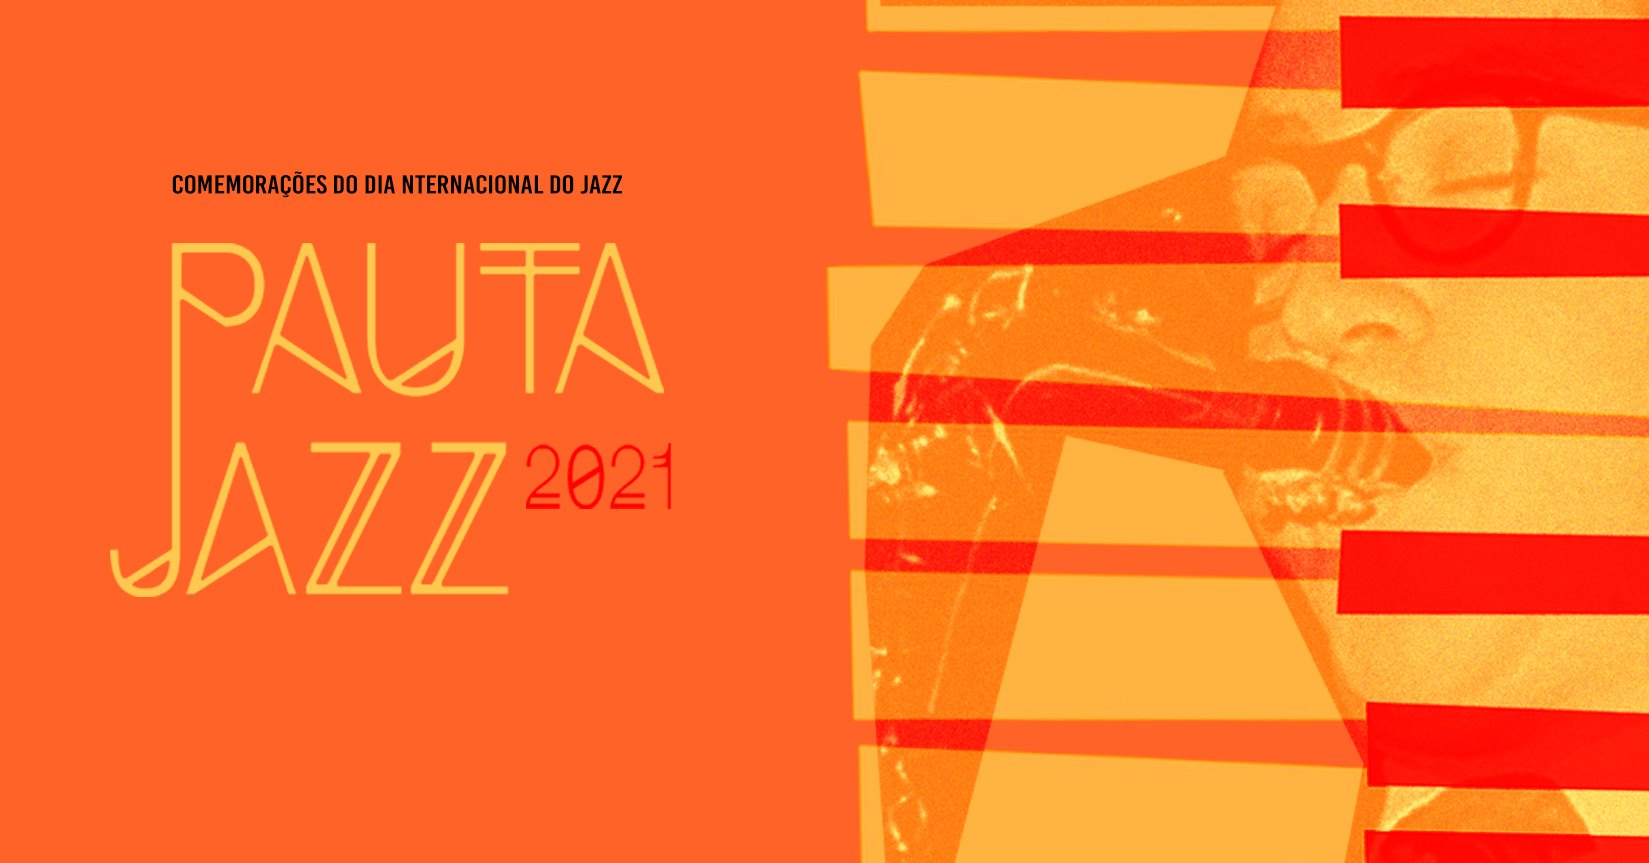 Pauta Jazz 2021